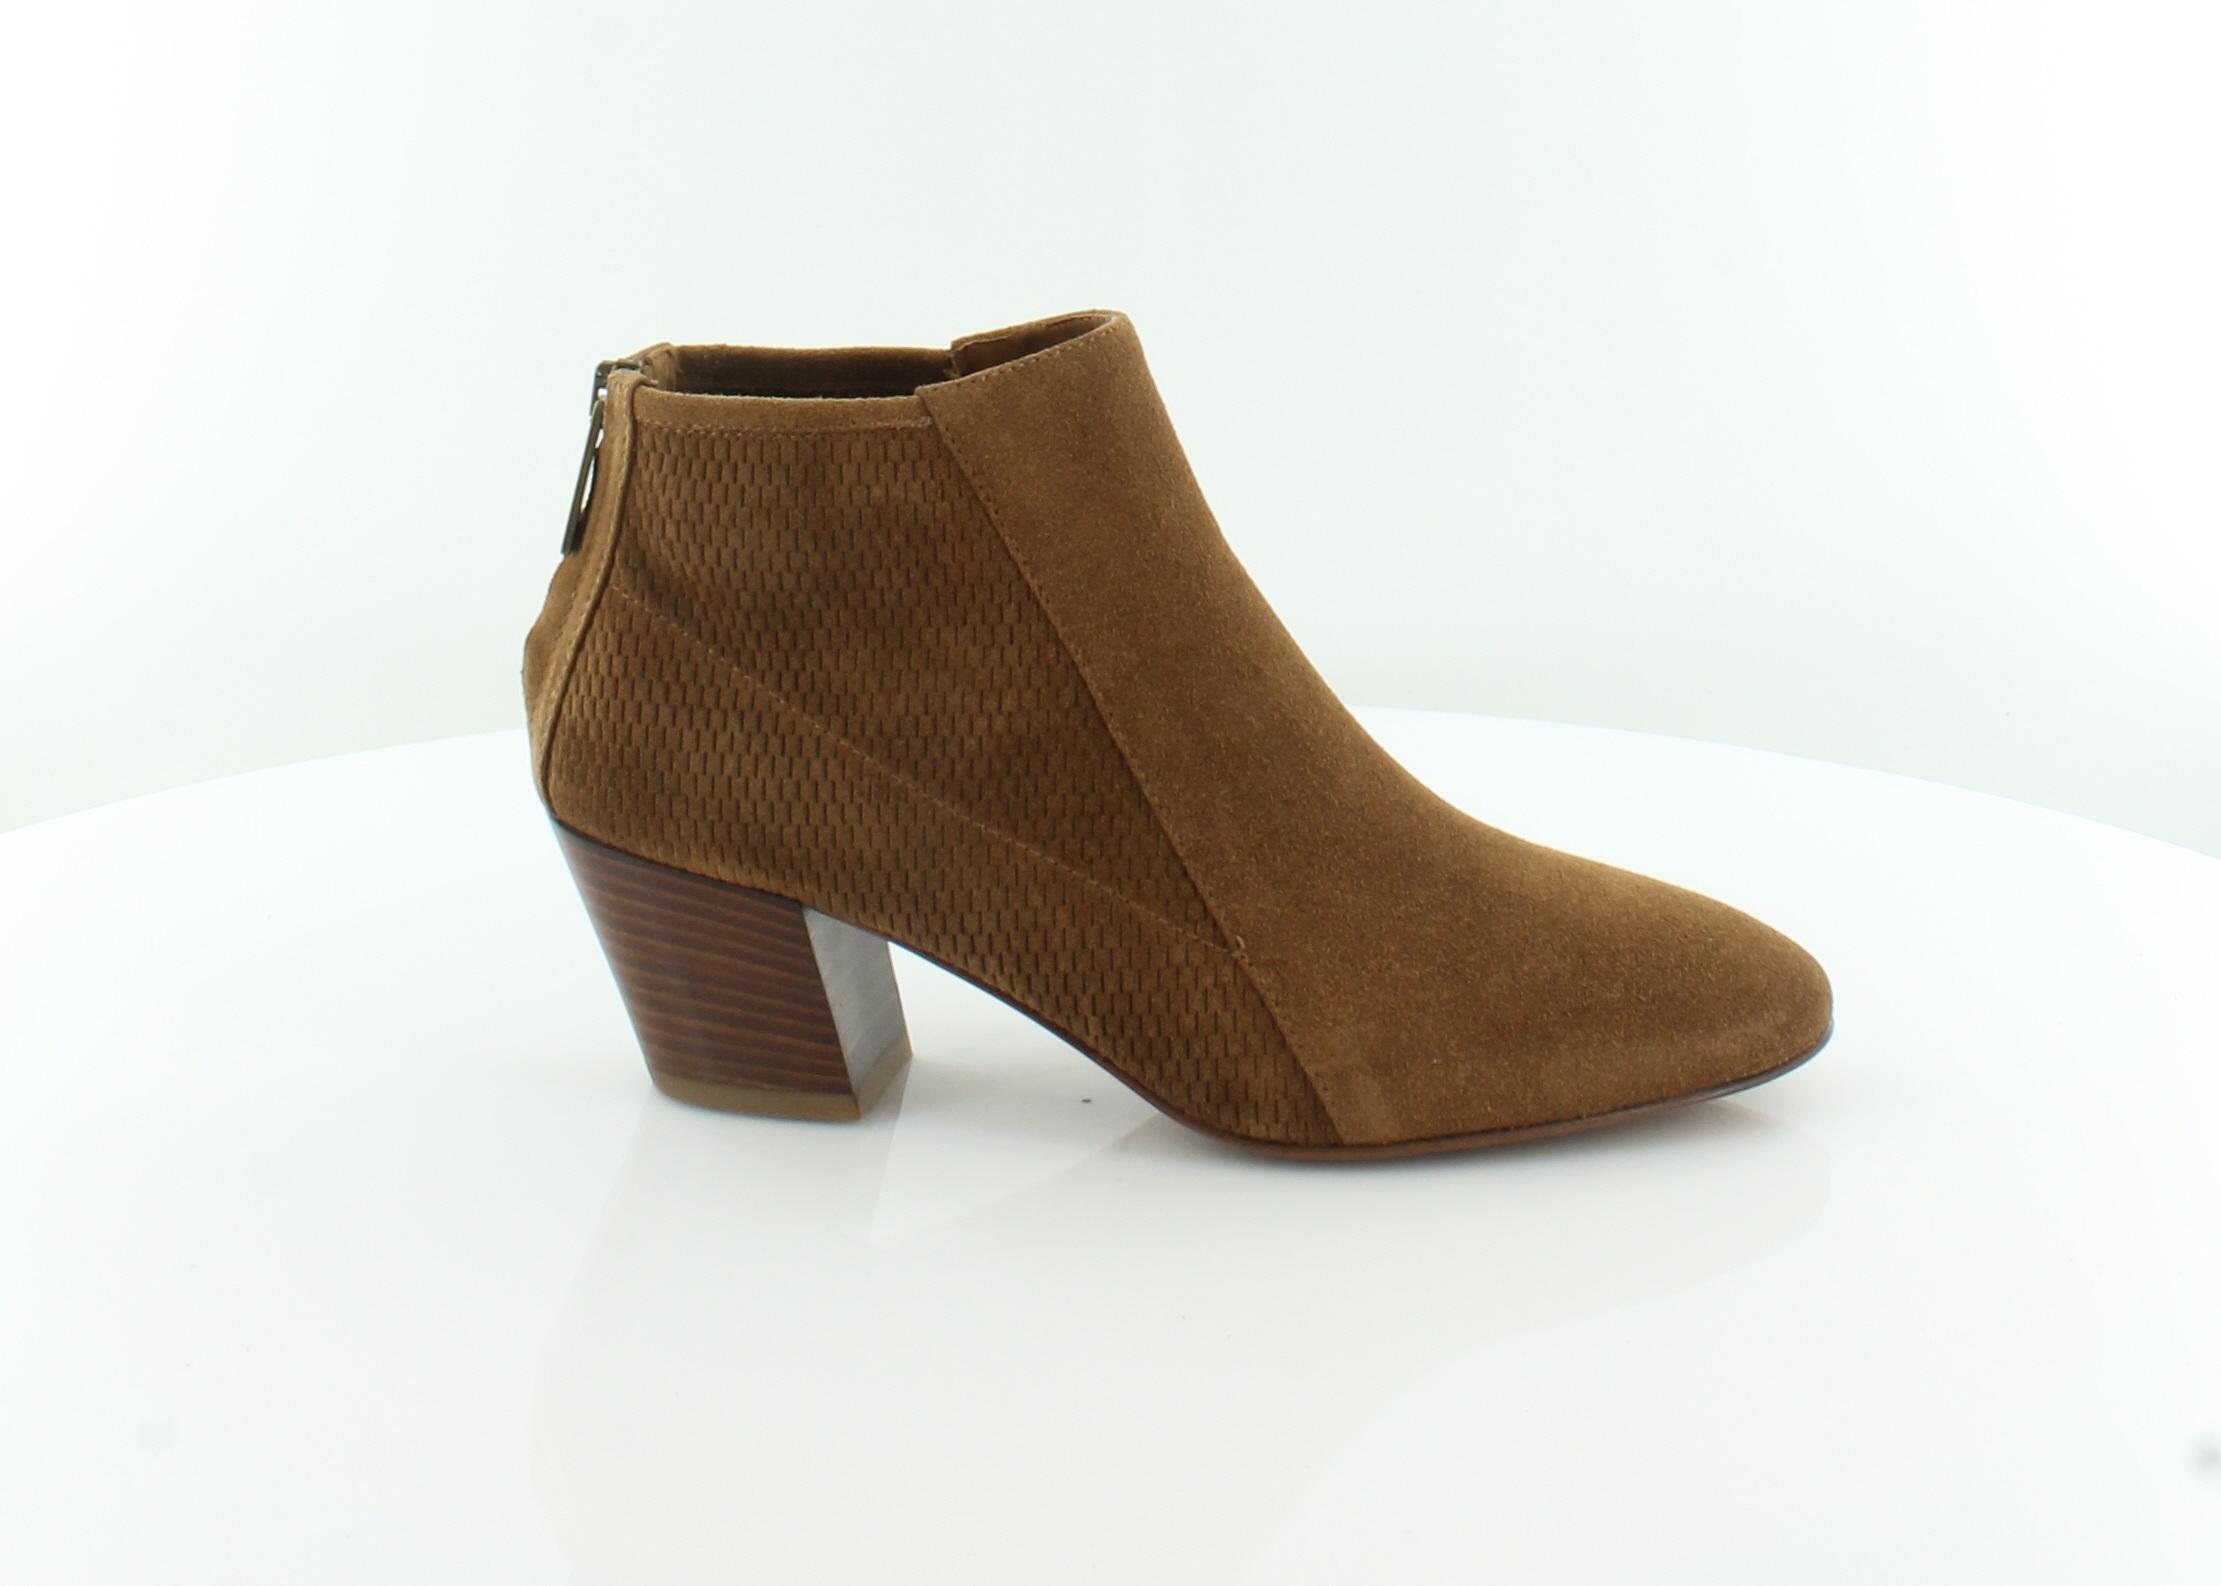 Aquatalia Farrow Brown Donna Shoes Size 7 M Stivali MSRP  425